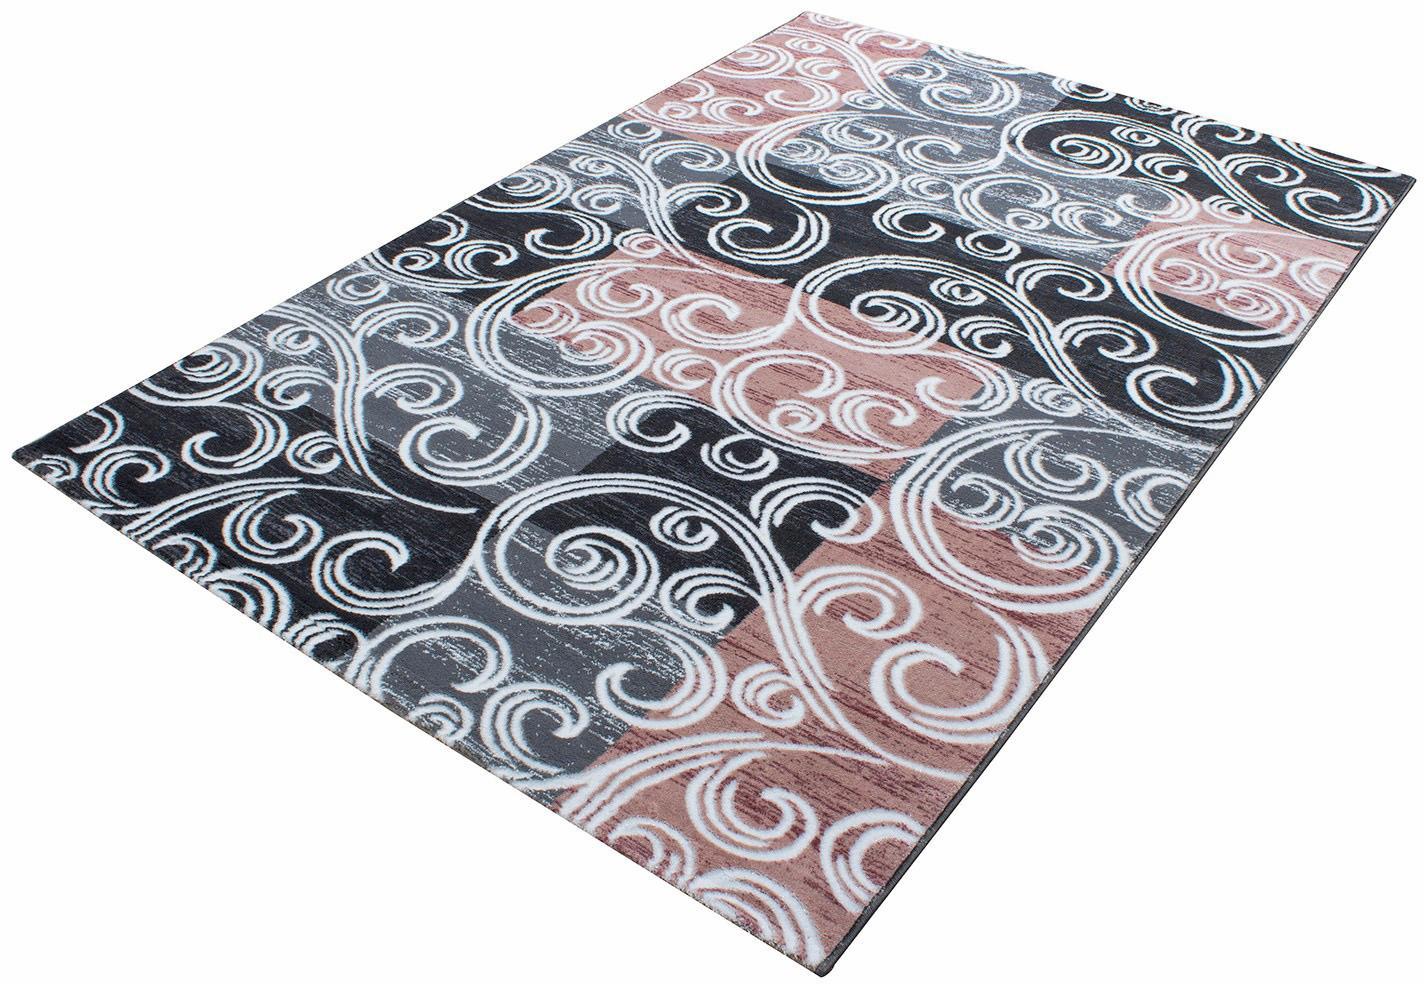 Teppich, »Toscana 3130«, Ayyildiz Teppiche, rechteckig, Höhe 12 mm, maschinell gewebt